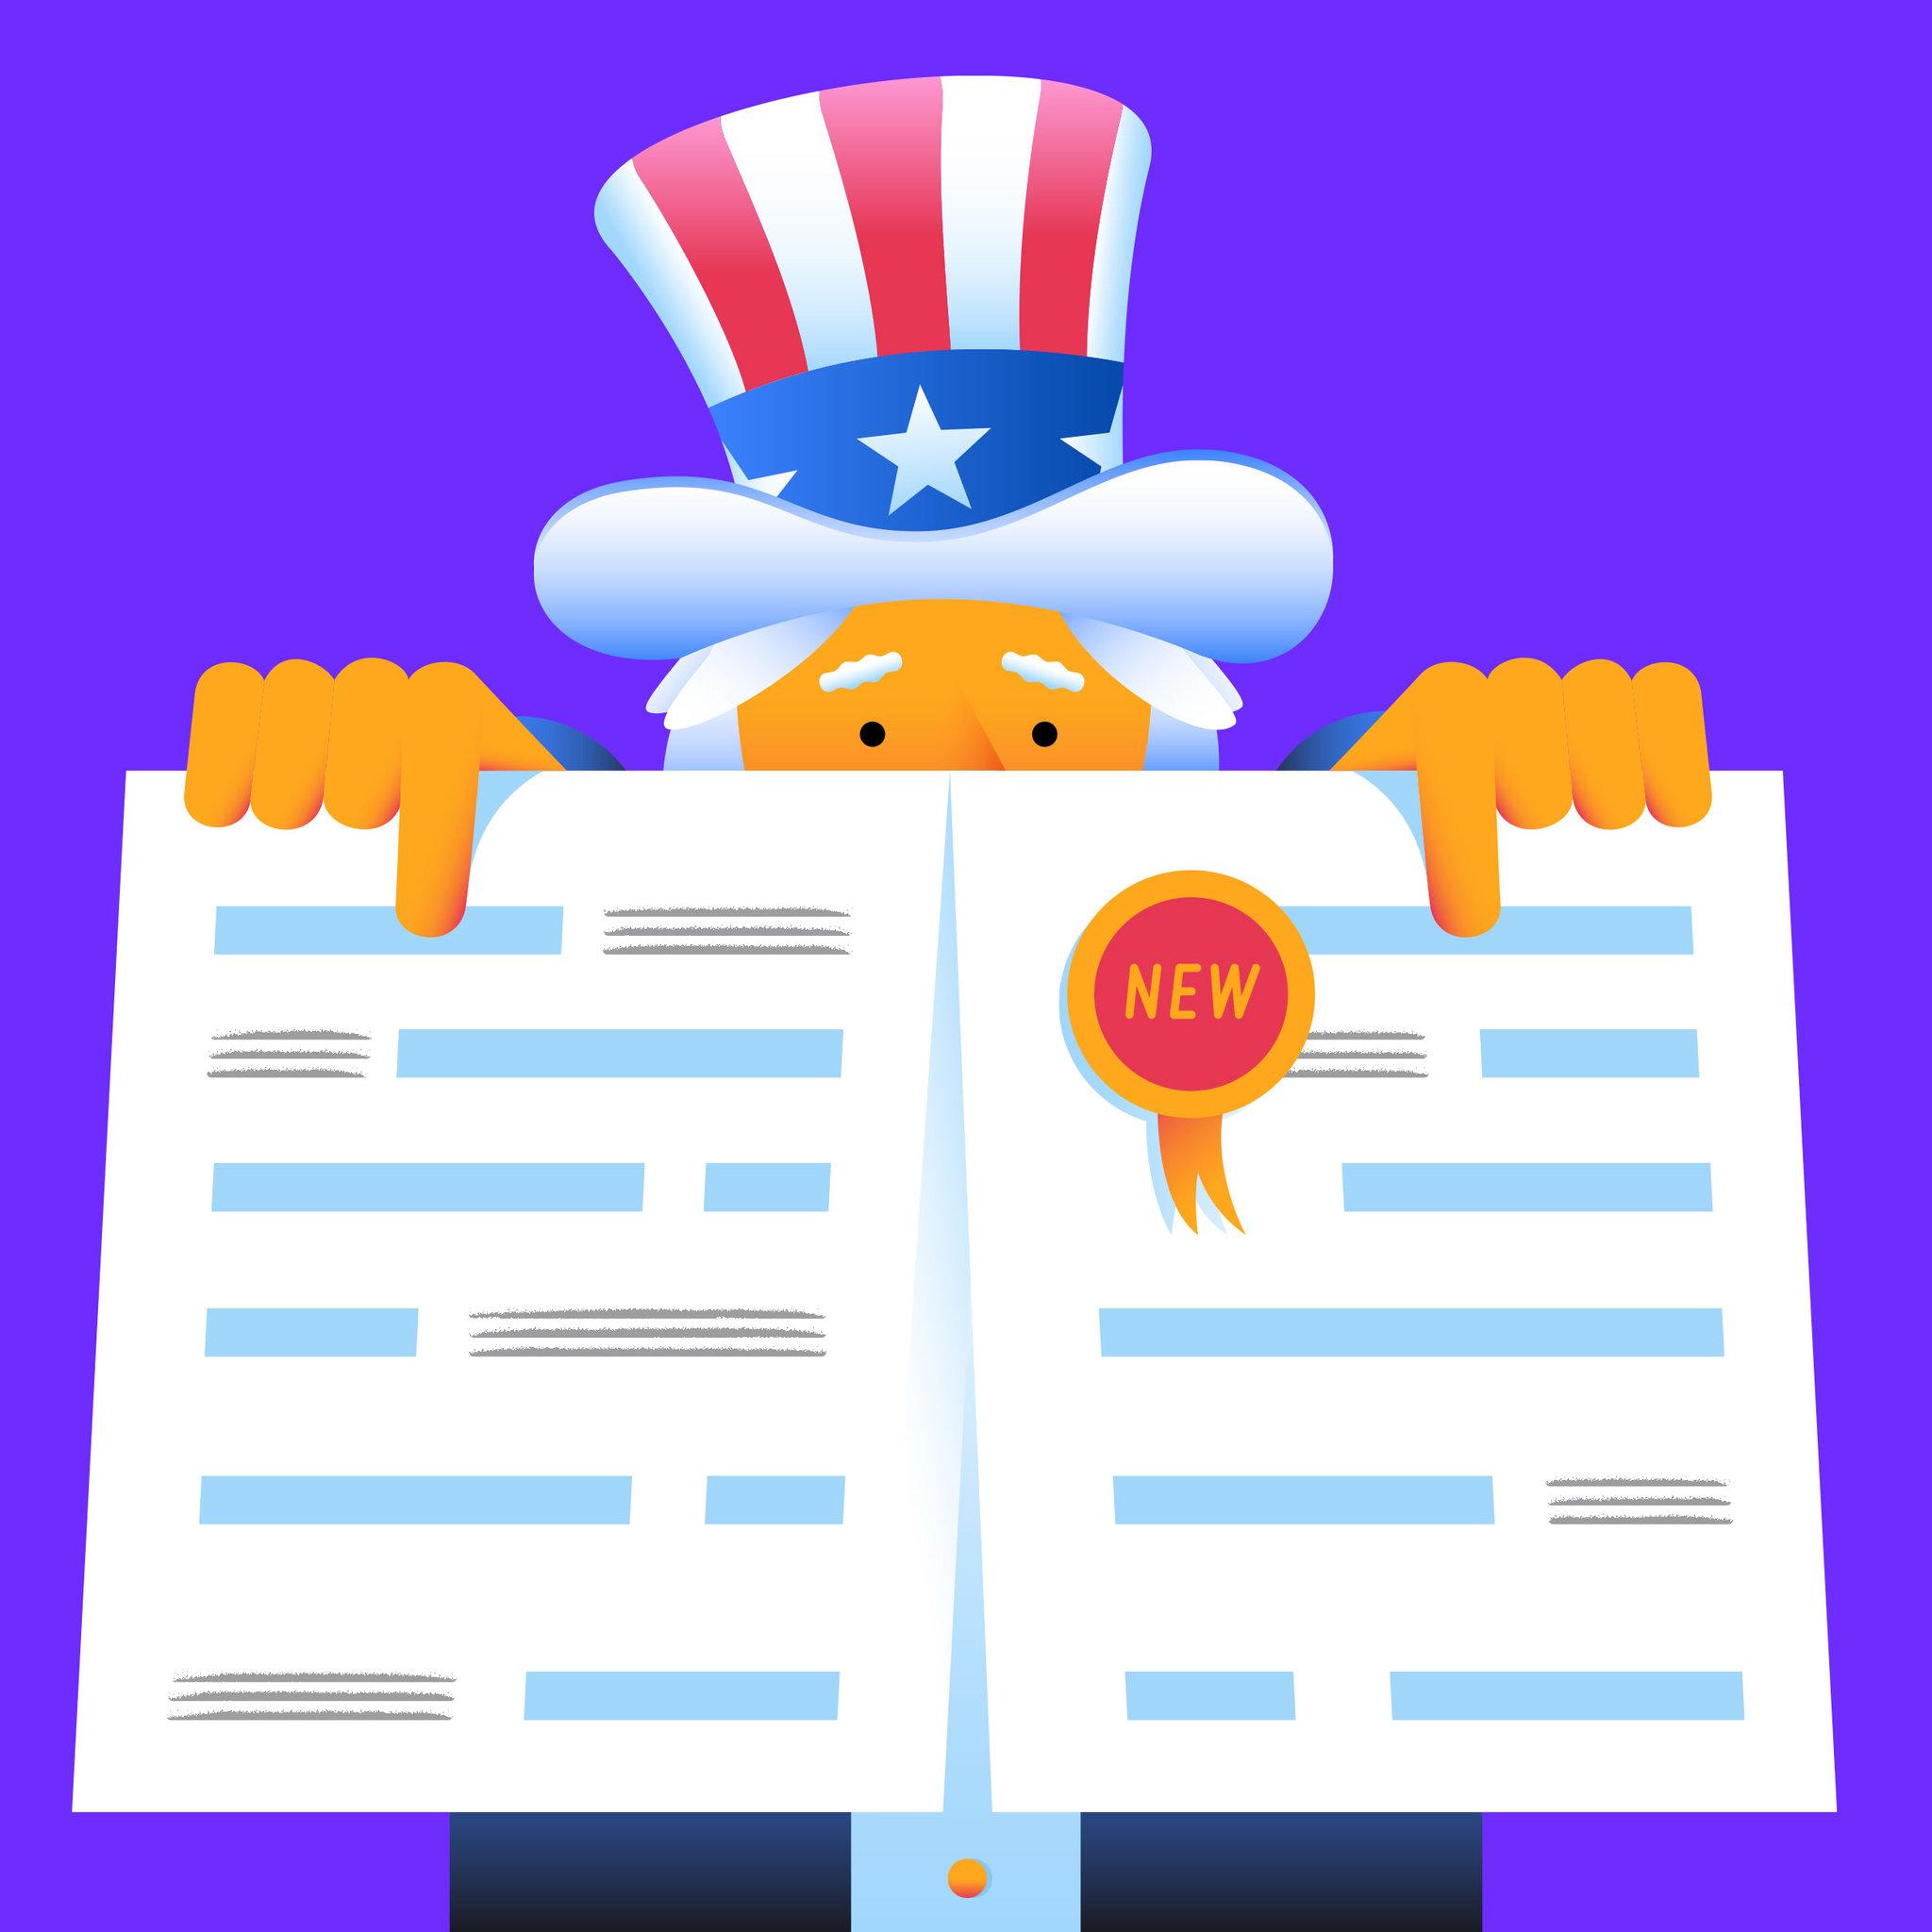 W 4 Personal Allowances Worksheet Questions My Worksheet